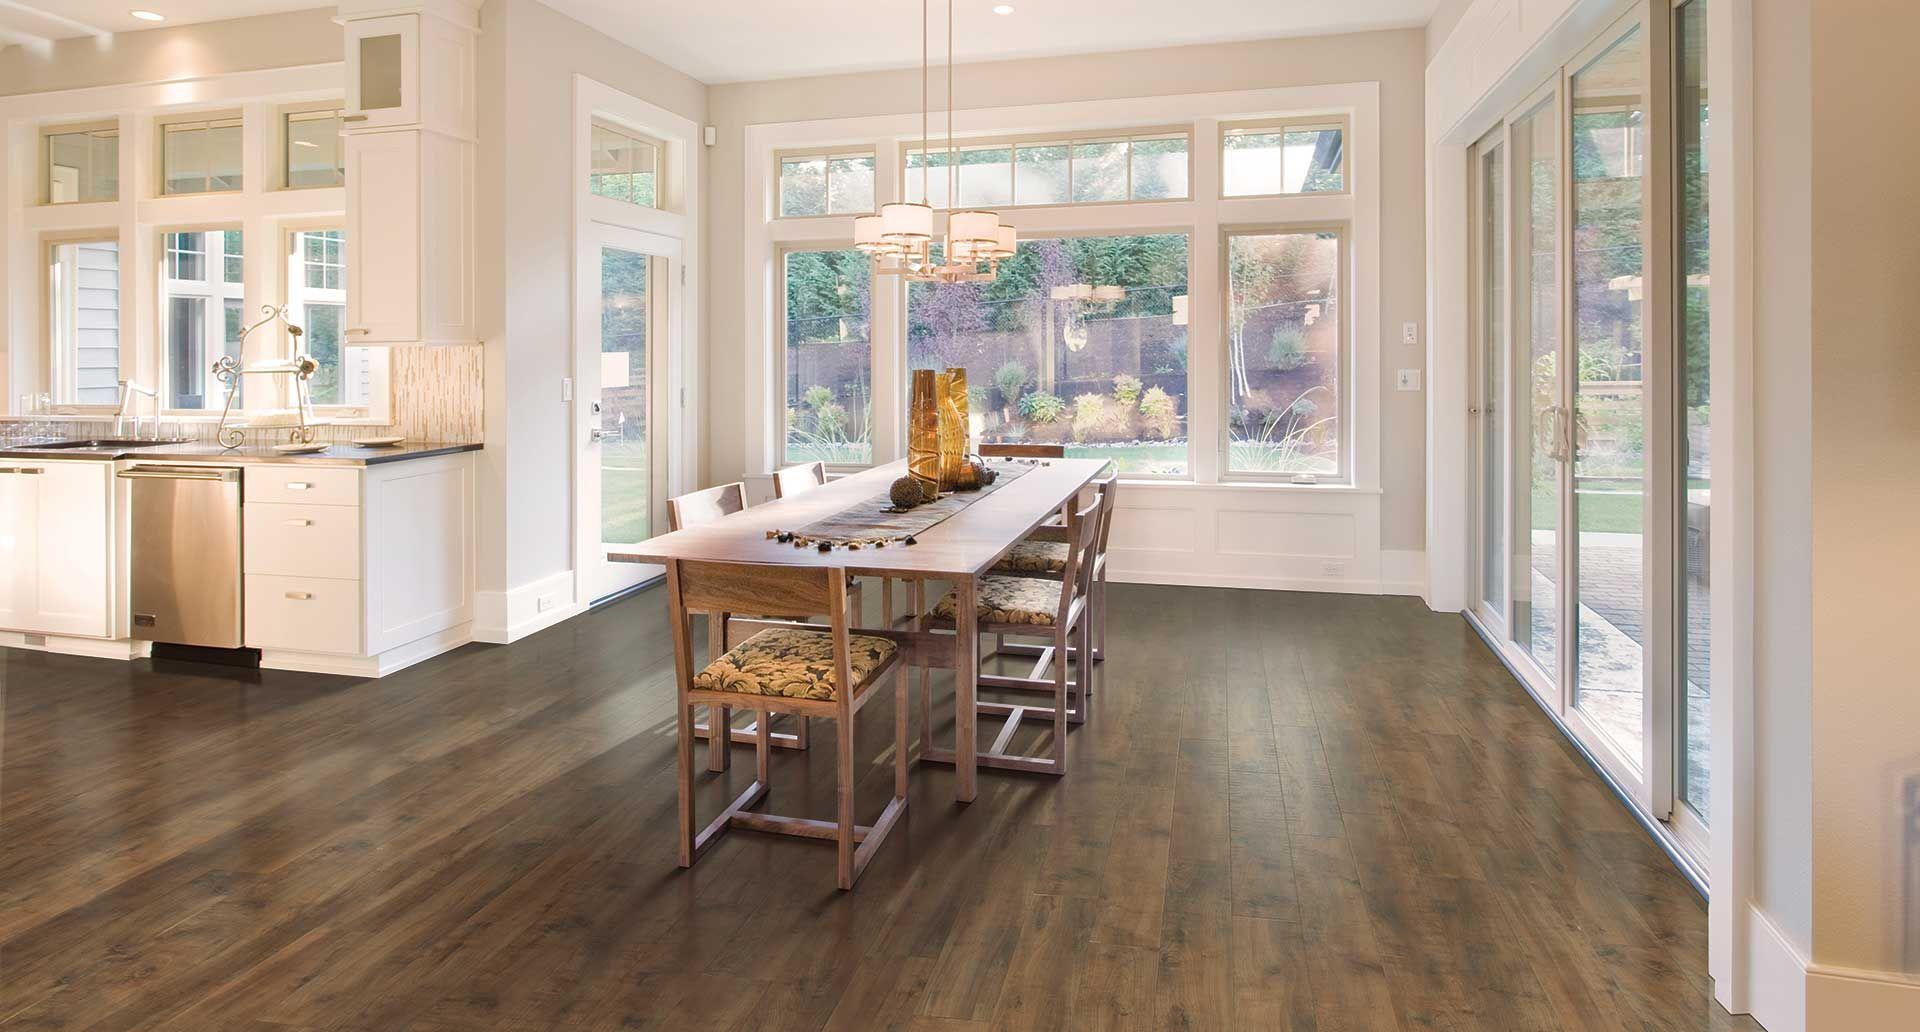 Harvest Cherry Smooth Laminate Floor Medium Burdy Color Finish 10mm 1 Strip Plank Flooring Easy To Install Pergo Lifetime Warranty